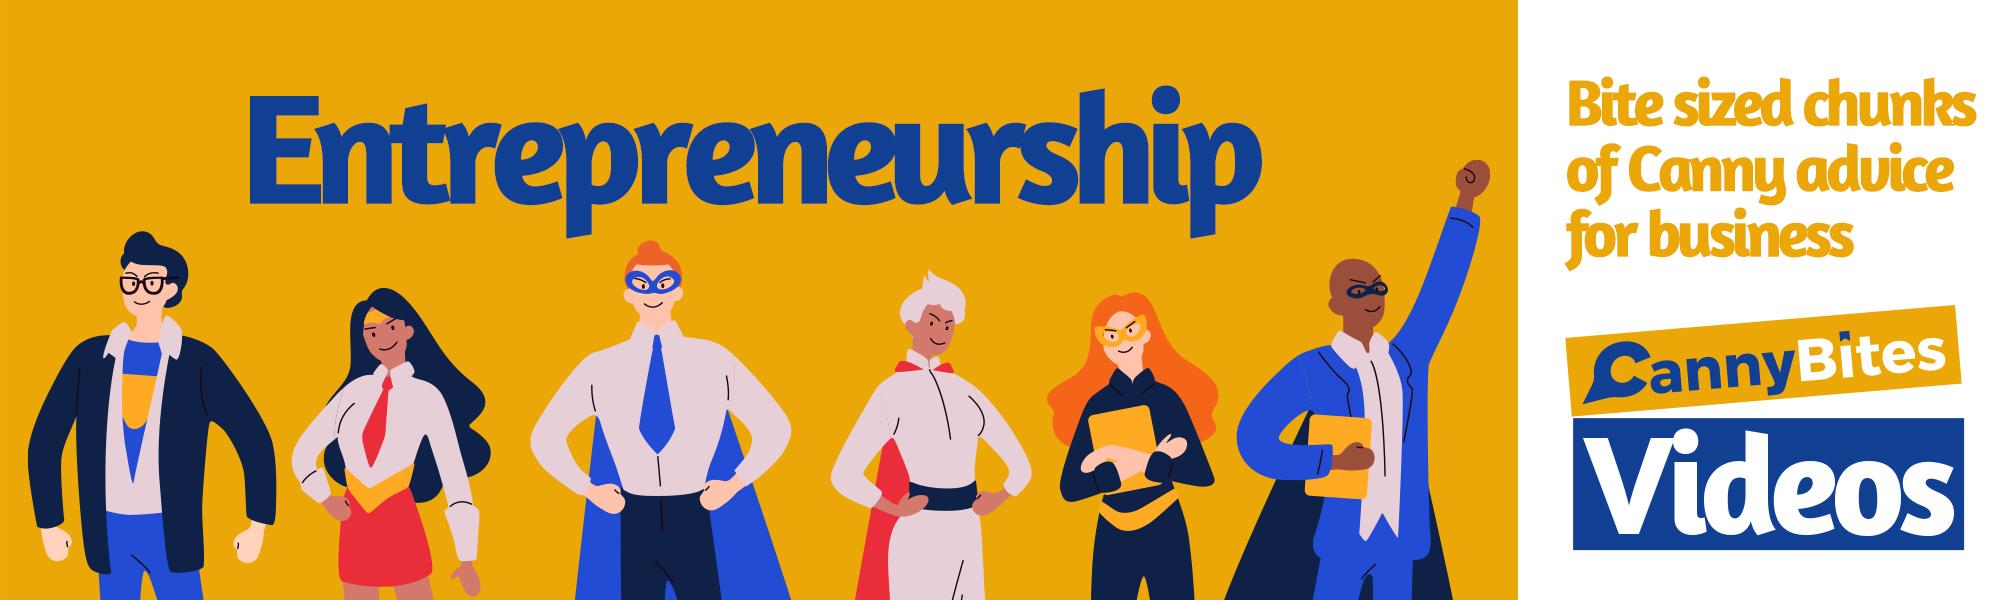 cannybites entrepreneurship